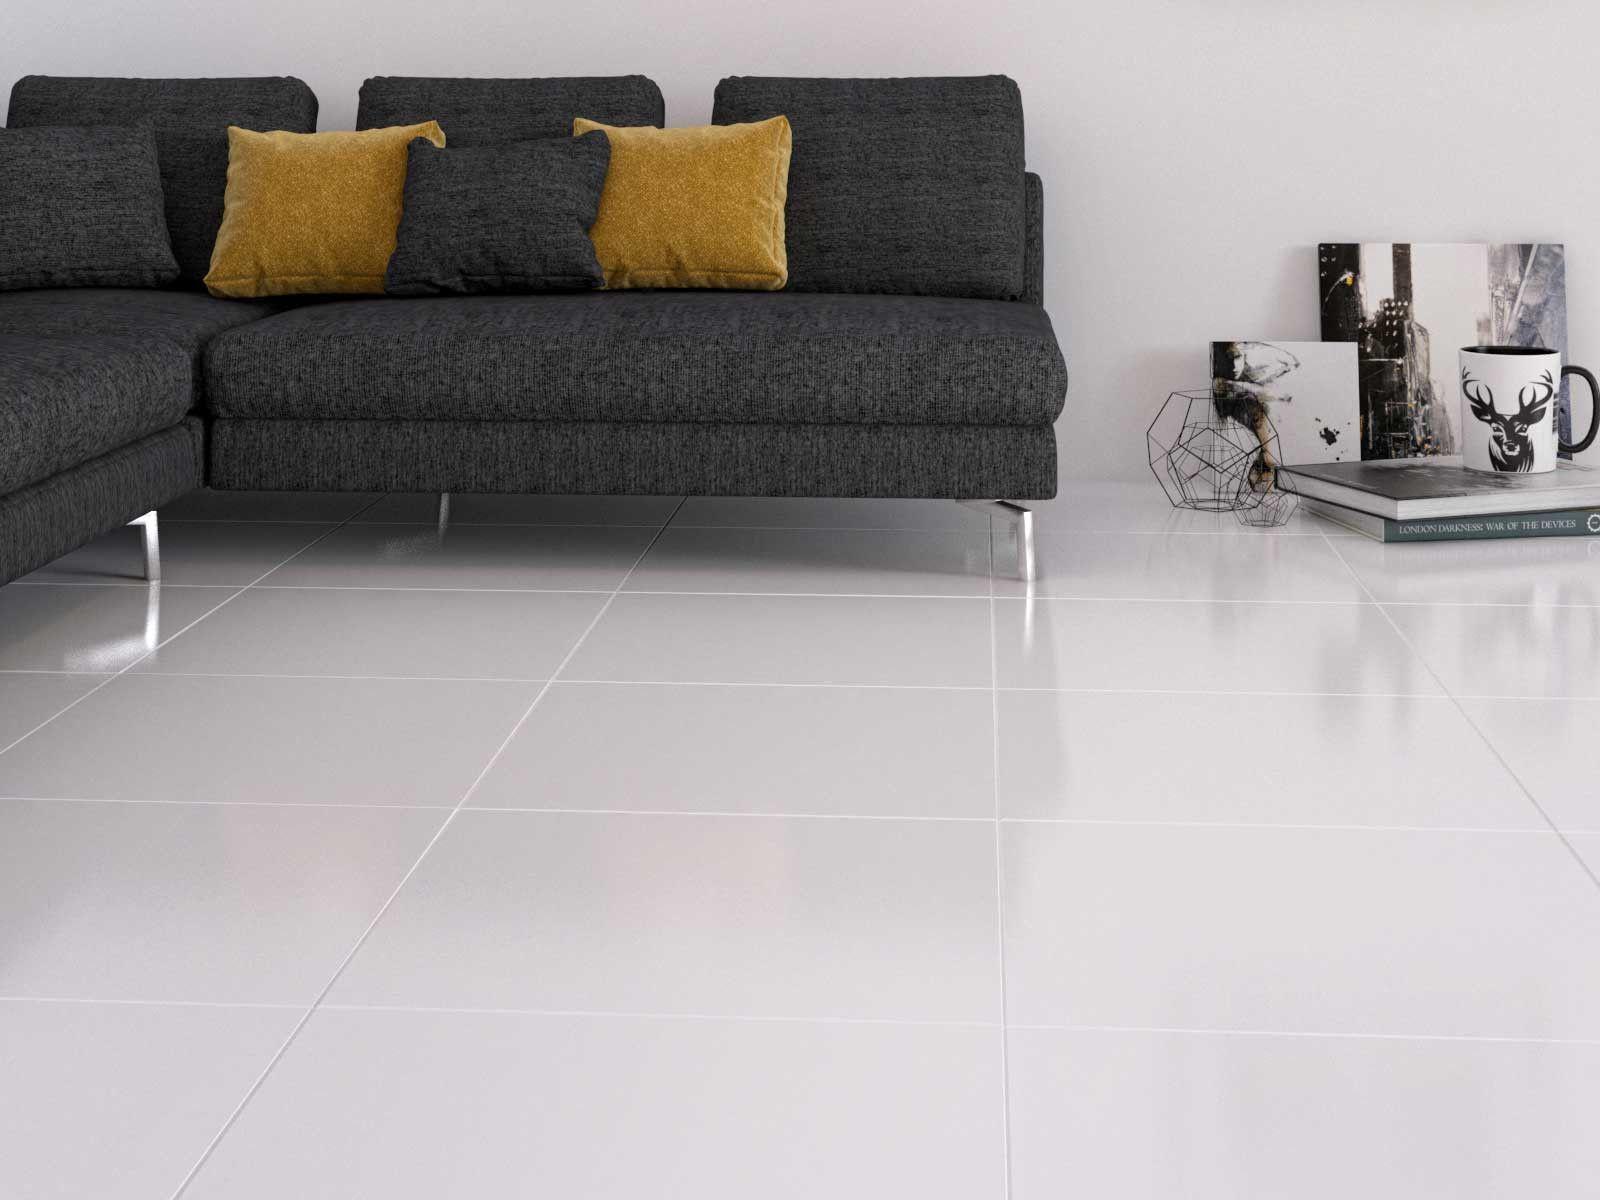 Brilliant White Shiny Glazed Porcelain Floor Tile 600 X 600mm Ctm R249m2 Porcelain Flooring Porcelain Floor Tiles White Porcelain Tile